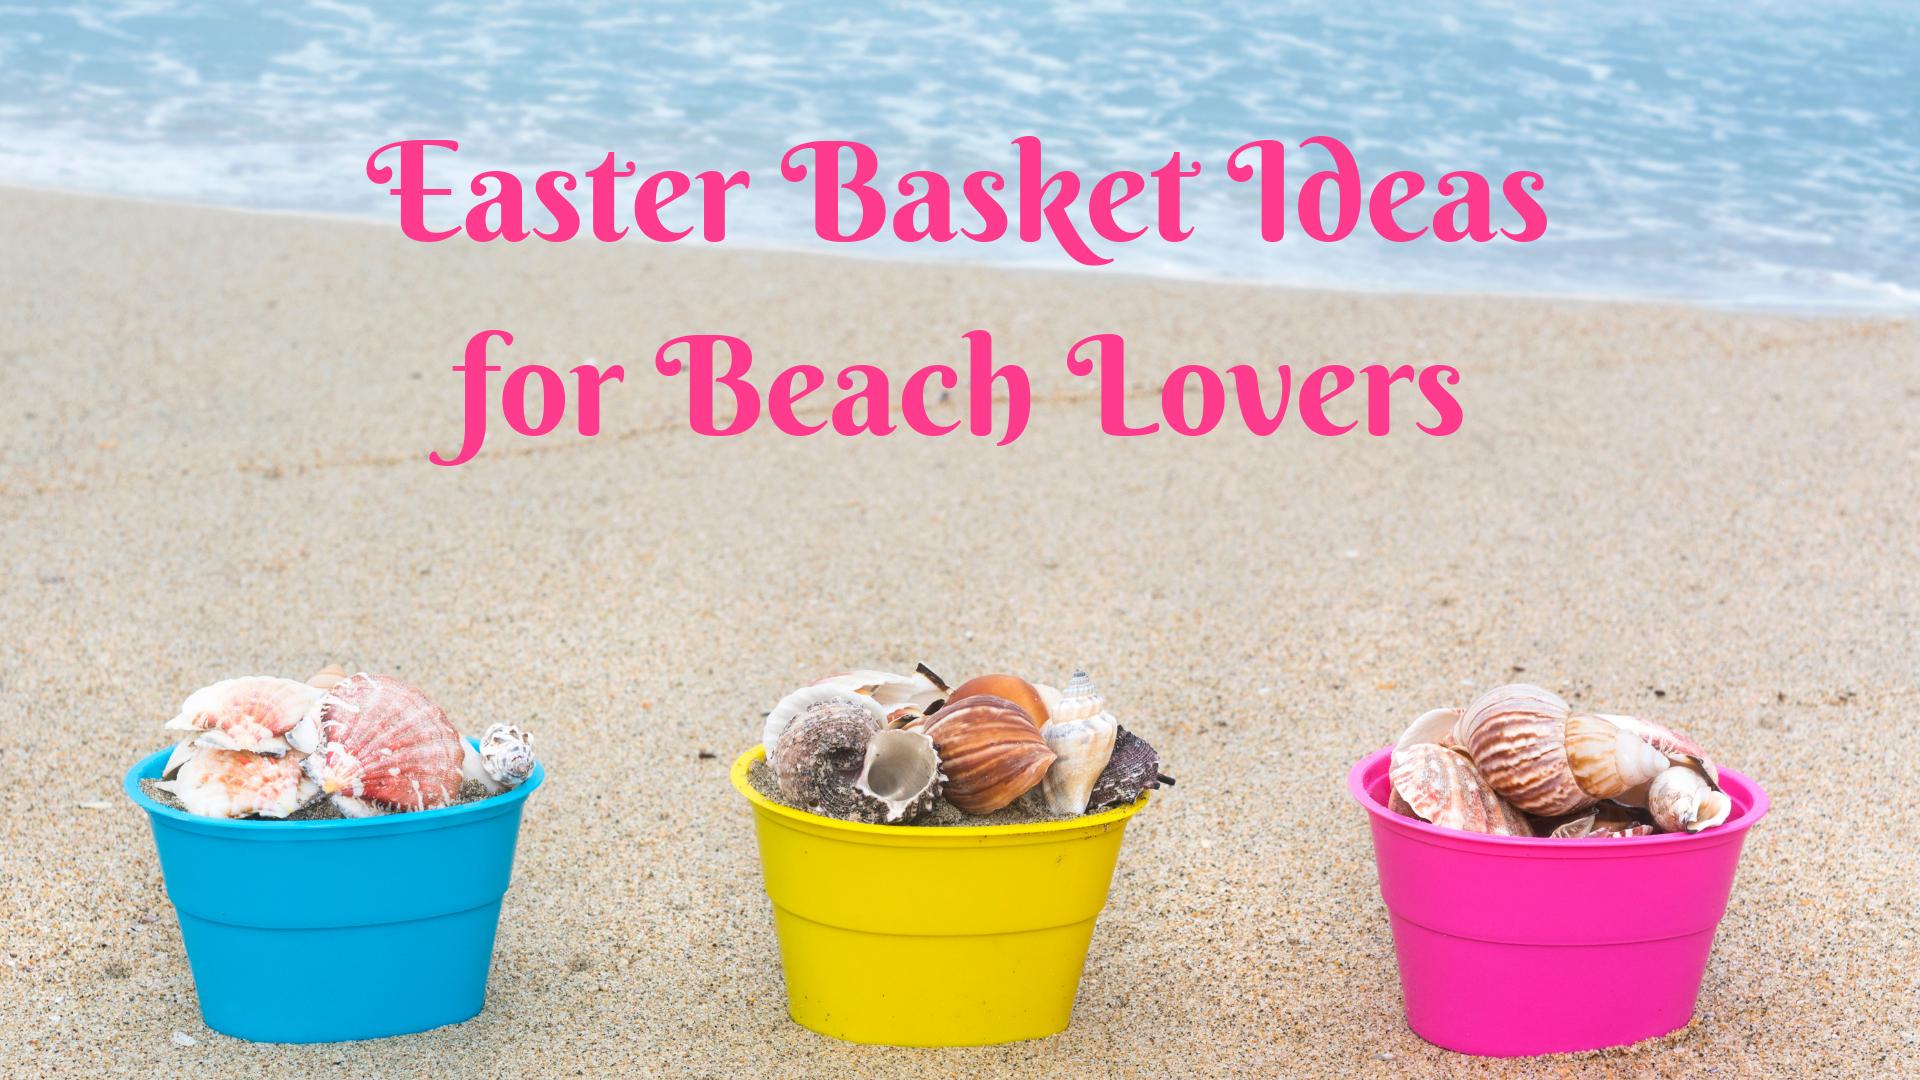 Beach-Themed Easter Baskets